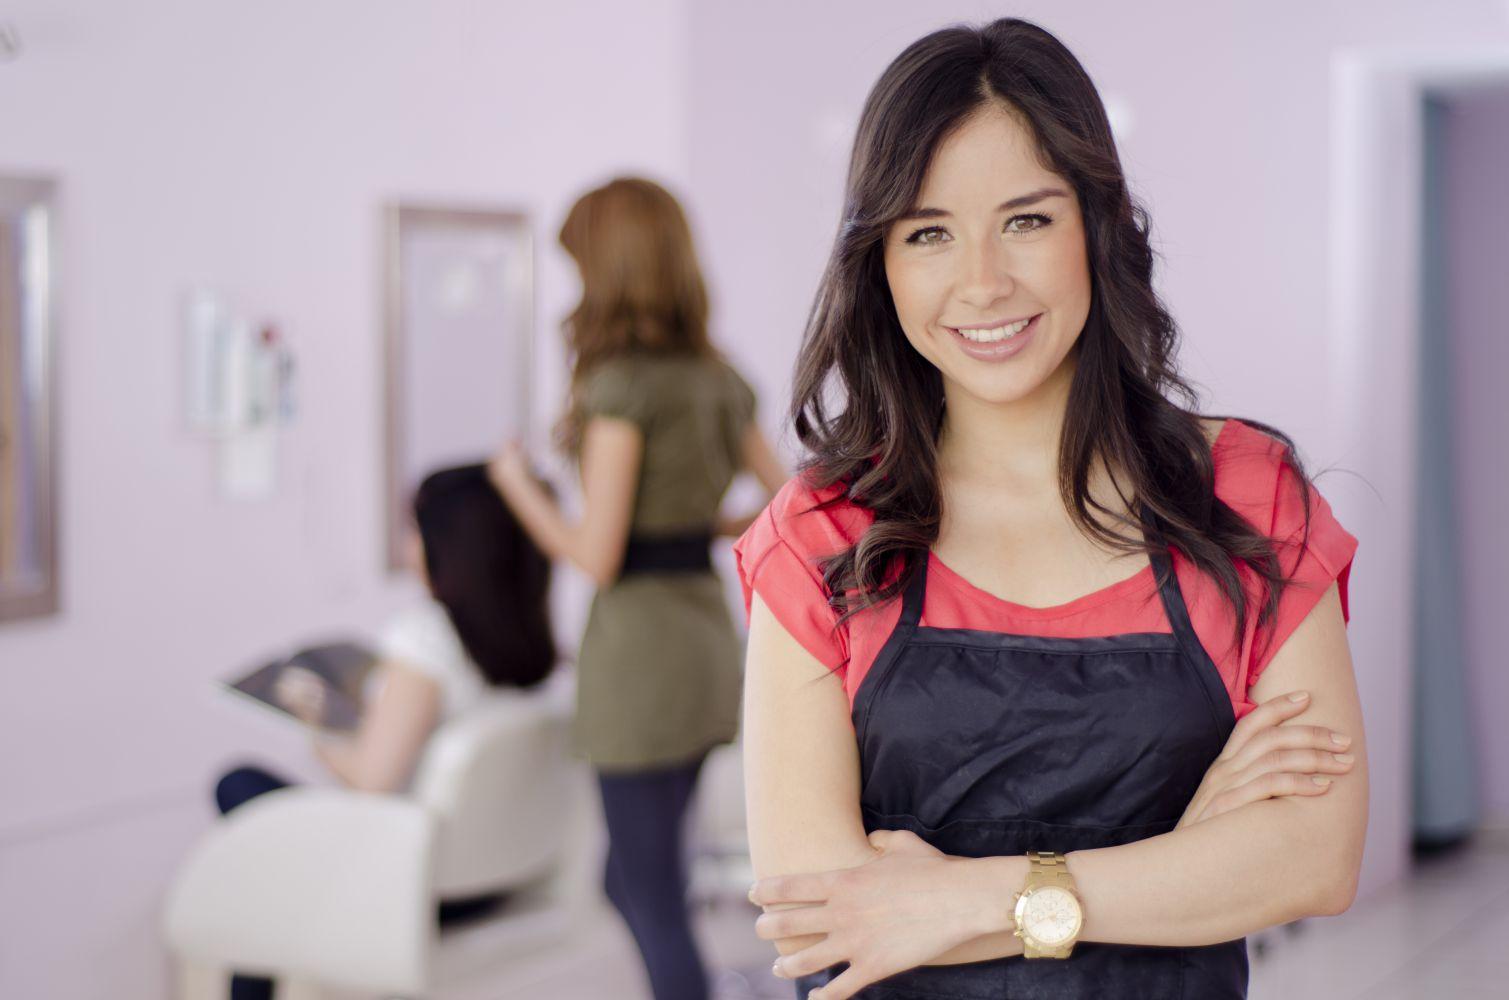 Plaza hair designs hair and beauty salon kapaa hi for Address beauty salon